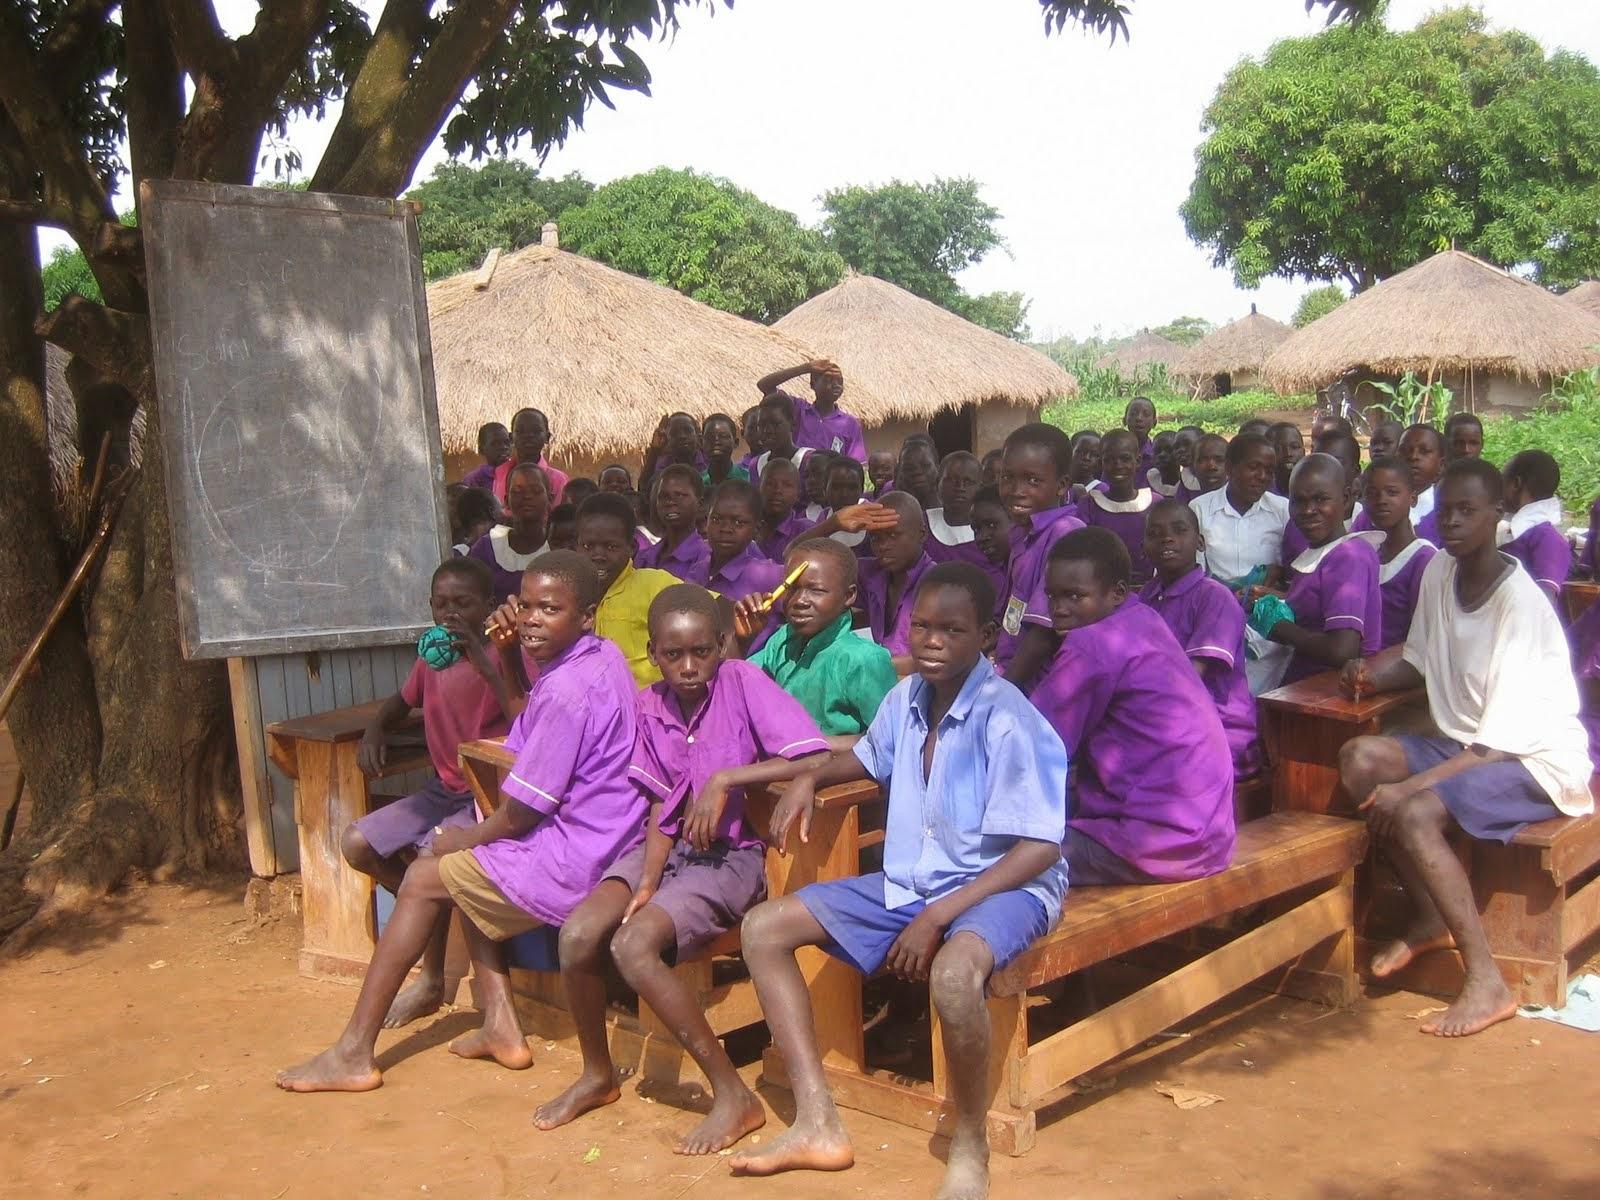 Uganda Pictures Summer 08 305.jpg